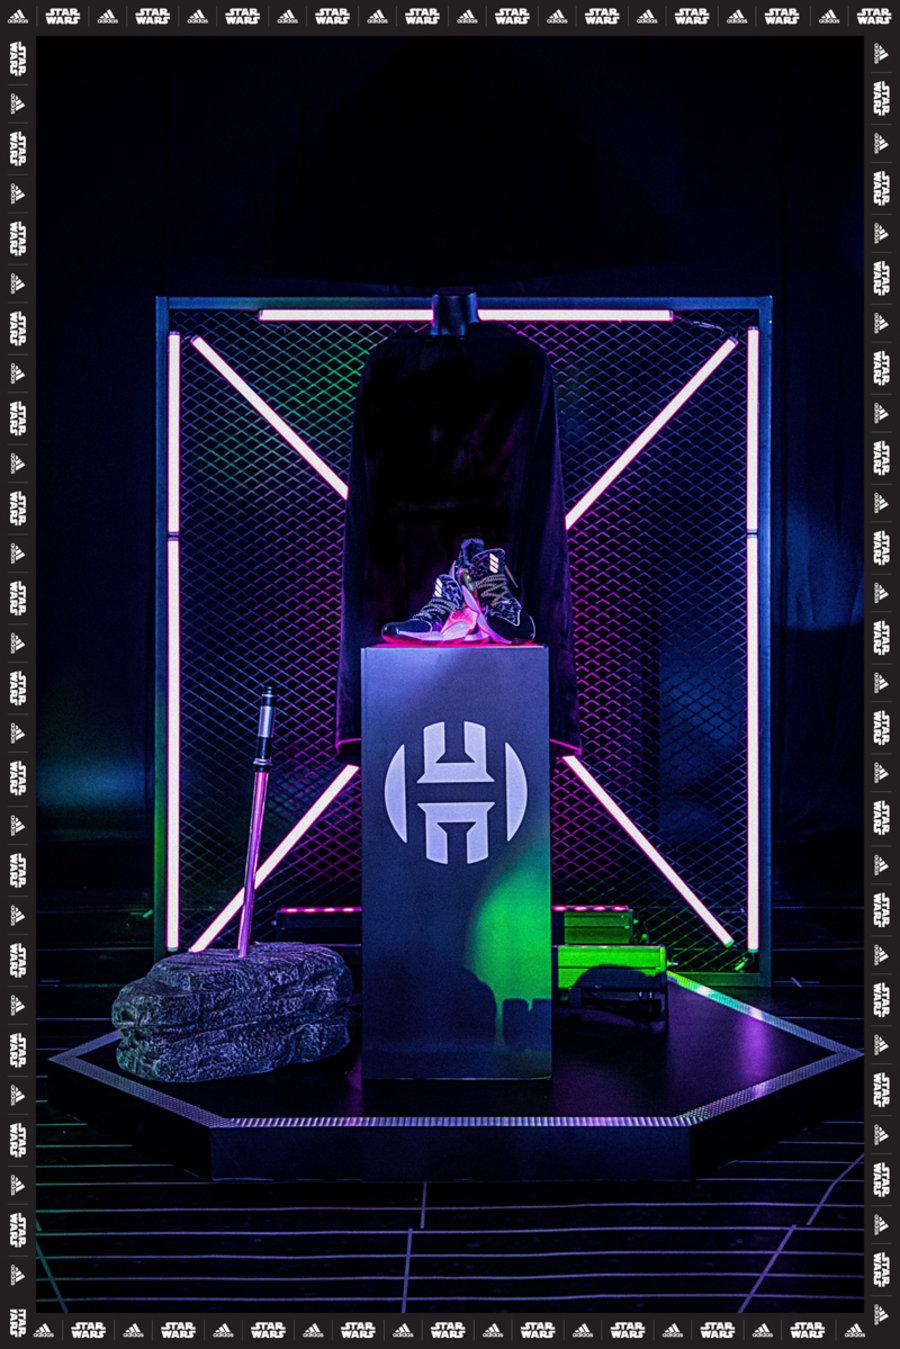 adidas,Harden Vol.4,Dame 5,D R  星战 x adidas 路人王篮球赛上海打响!三款光剑战靴正在热卖!